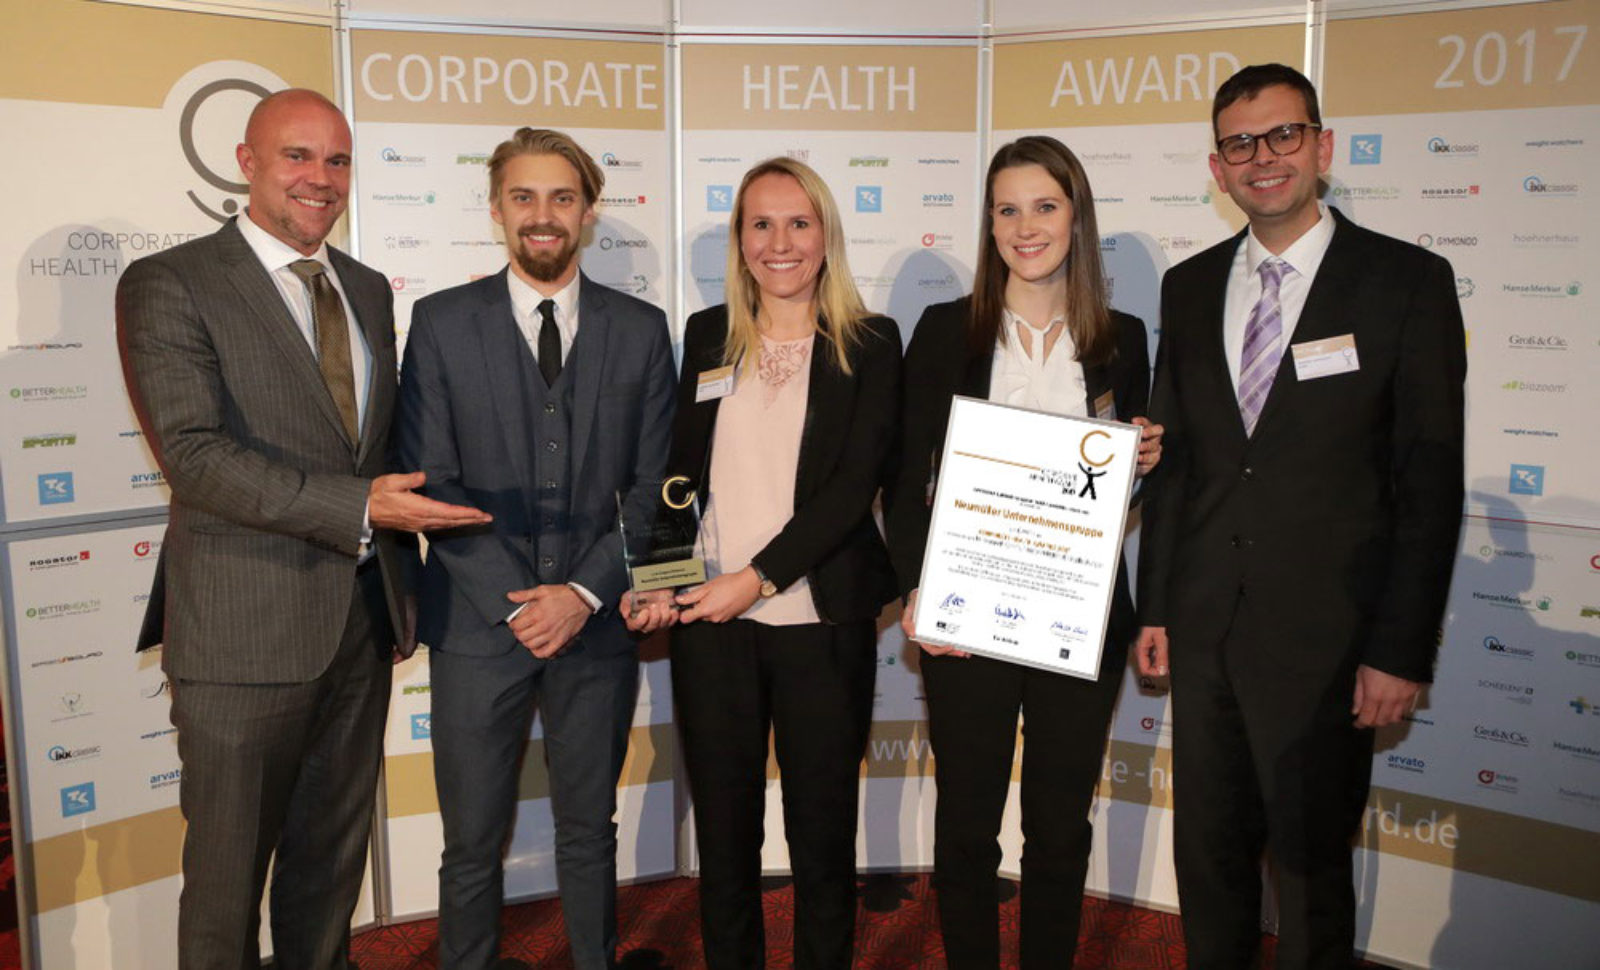 Corporate Health Award 2017